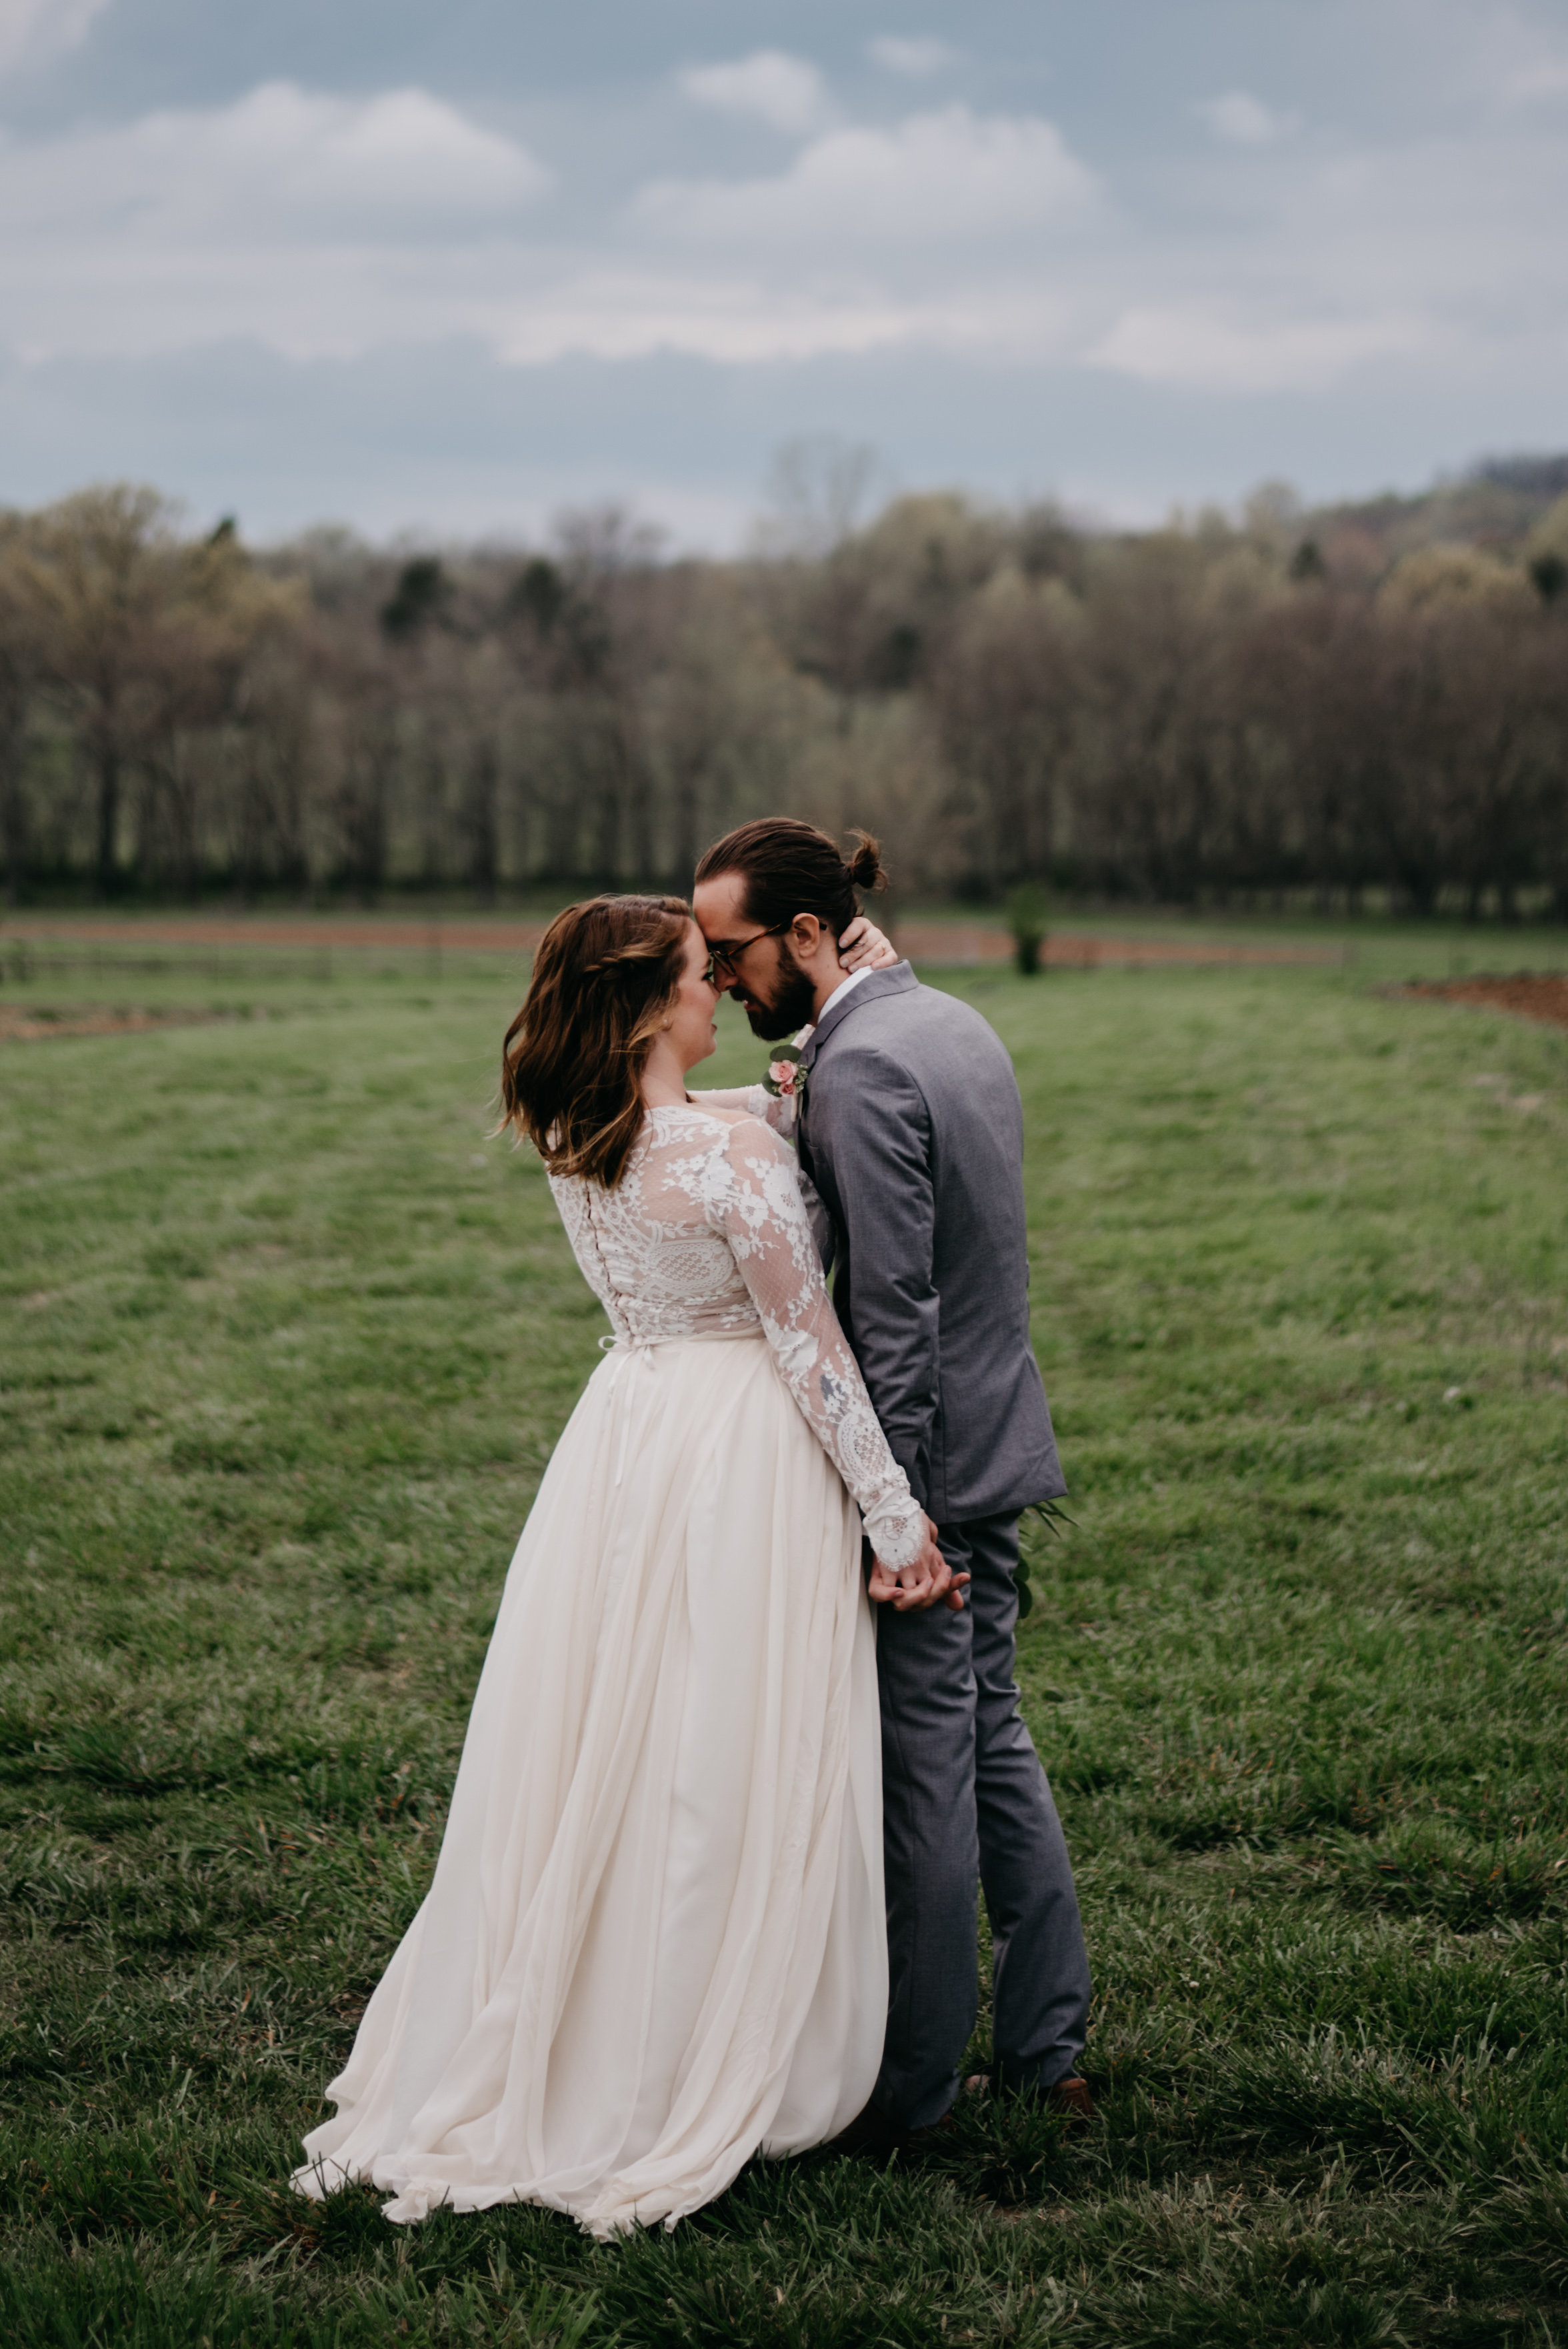 Allenbrooke-Farms-Nashville-Wedding-Photographers 25.jpg